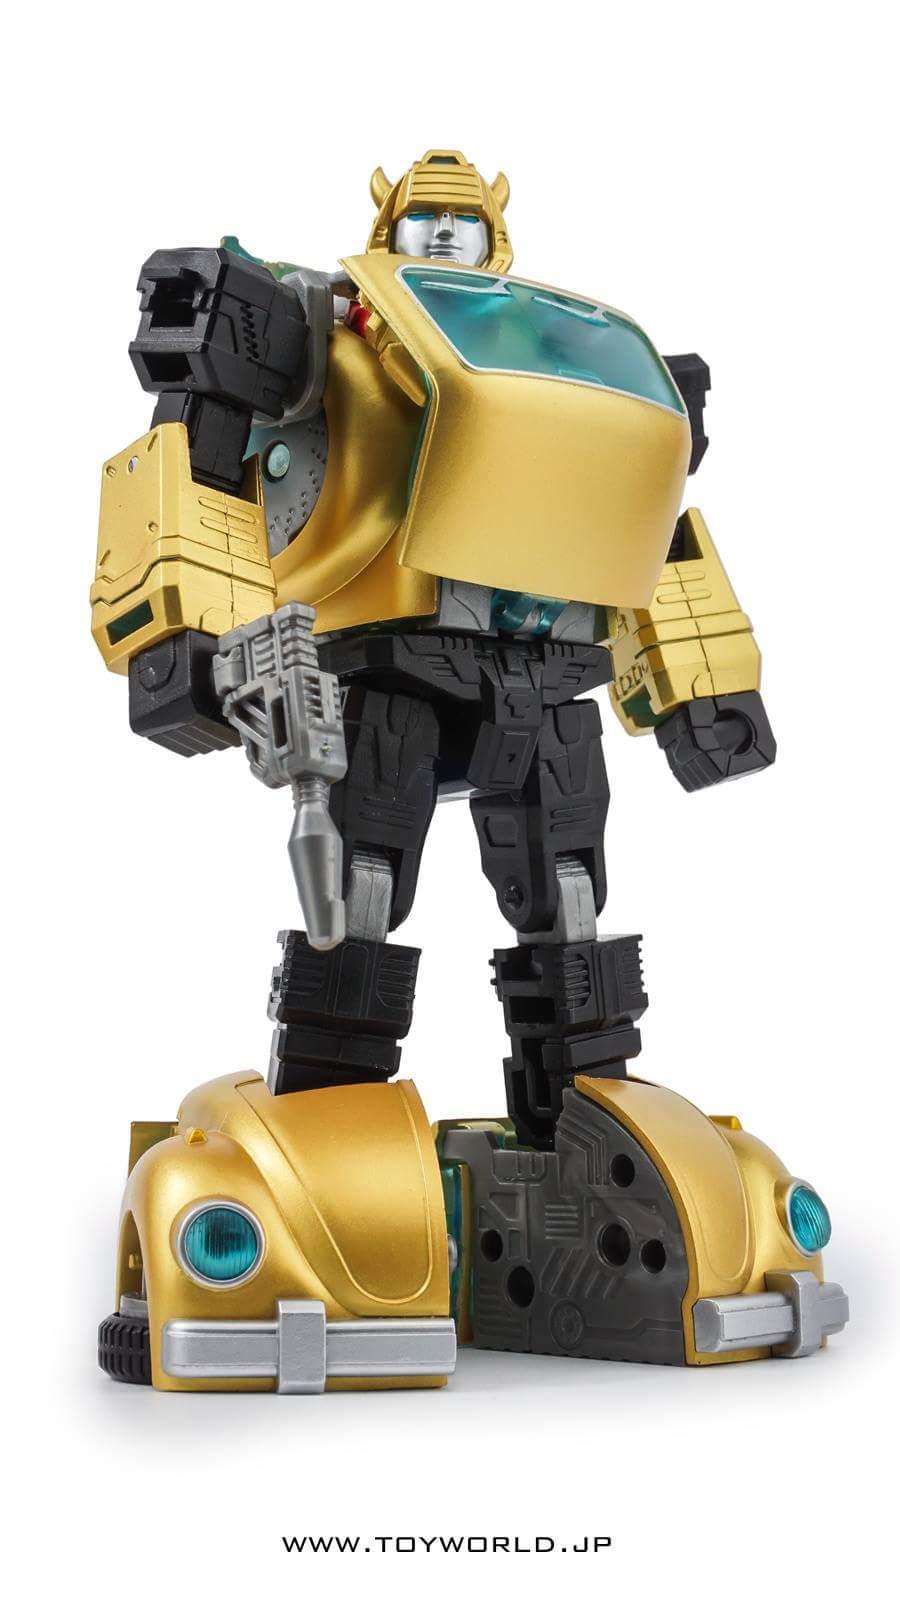 [Toyworld][Zeta Toys] Produit Tiers - Minibots MP - Gamme EX SXkrN9mv